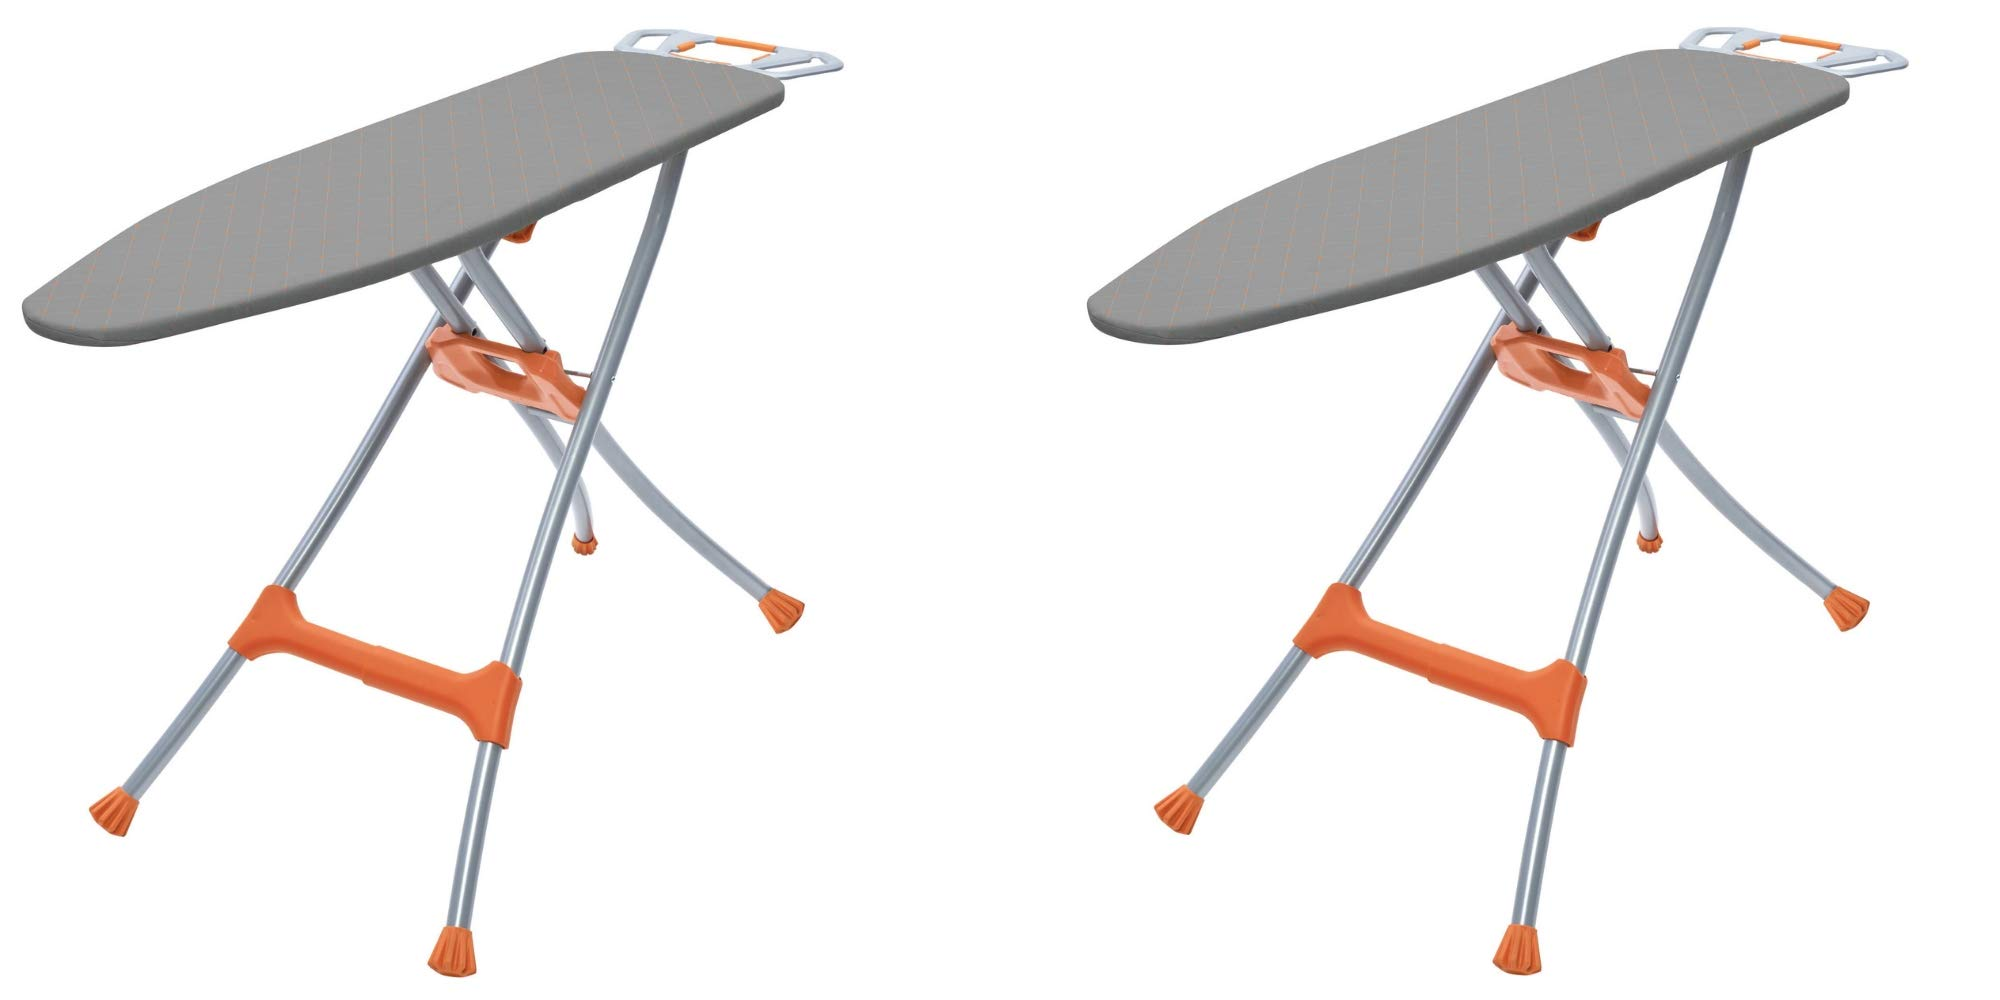 Homz Durabilt Premium Steel Mesh Top Ironing Board, Silver/Orange / 2-Pack